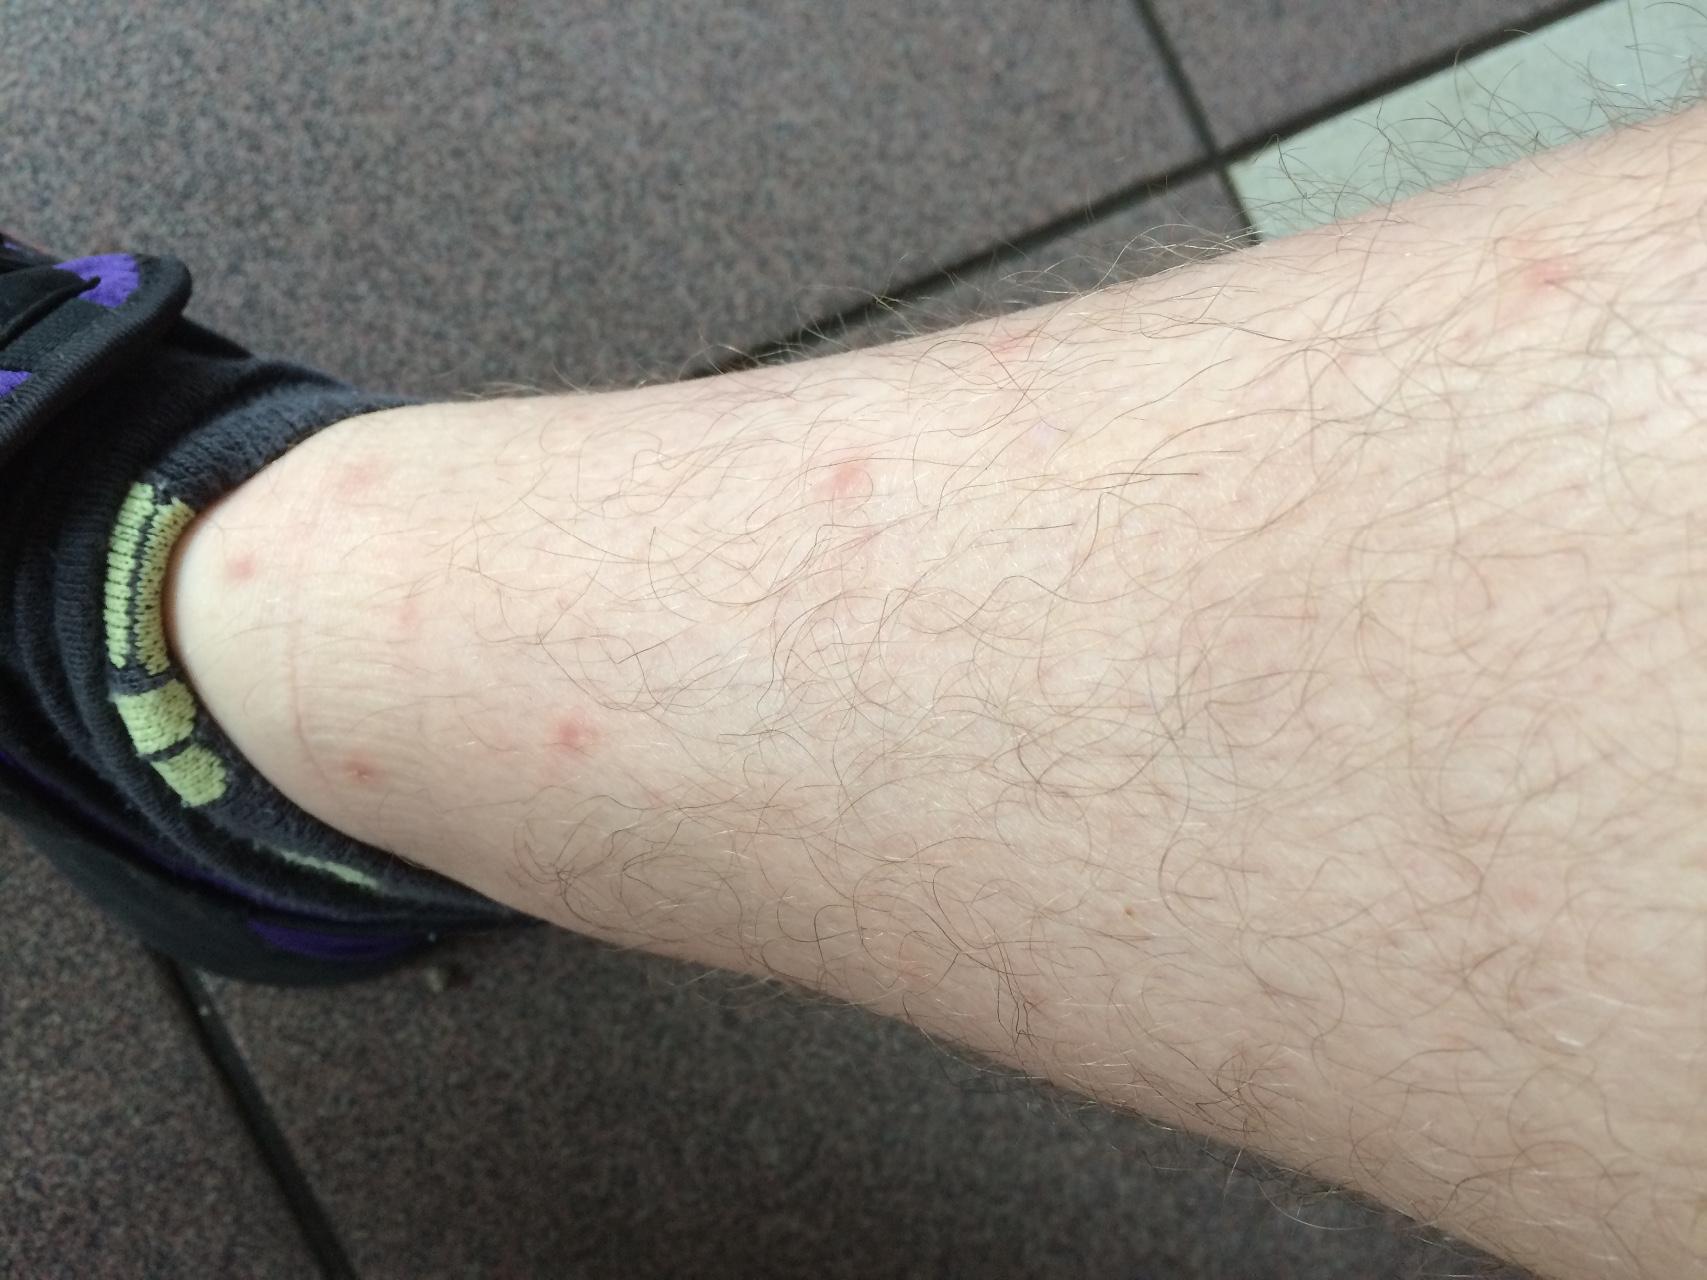 аллергия на укусы муравьев лечение